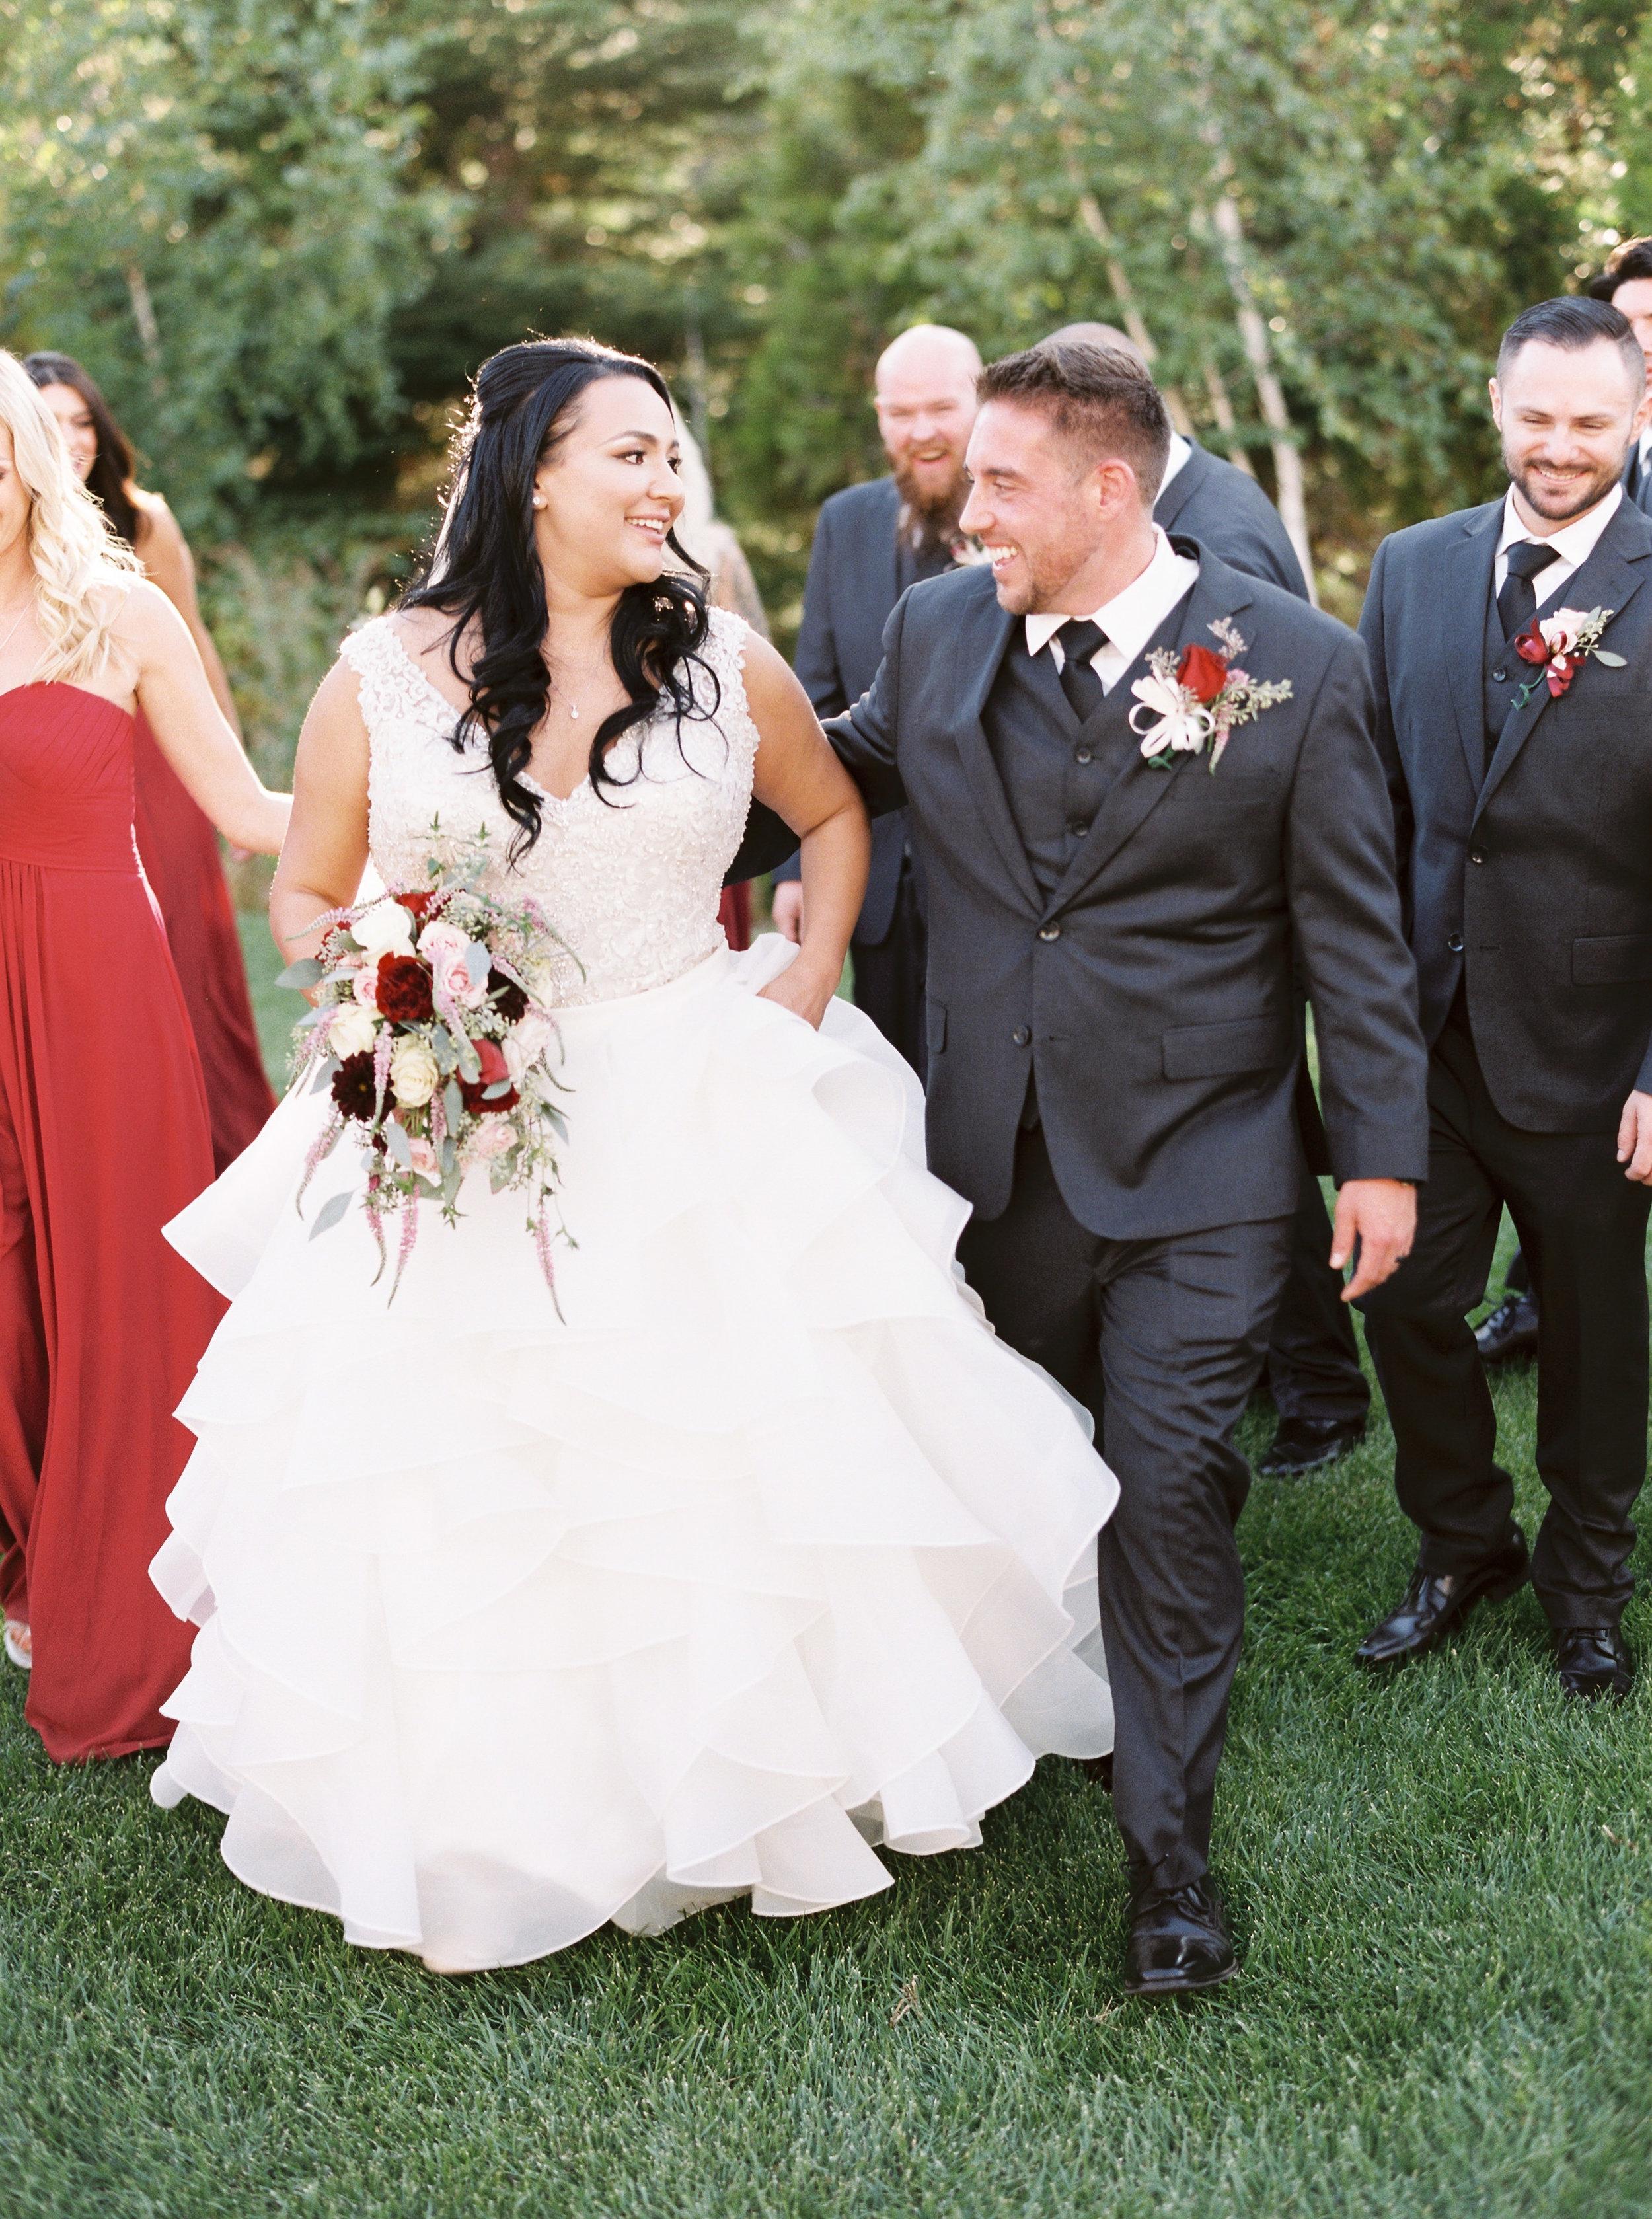 Tenaya-lodge-wedding-at-yosemite-national-park-california-35.jpg